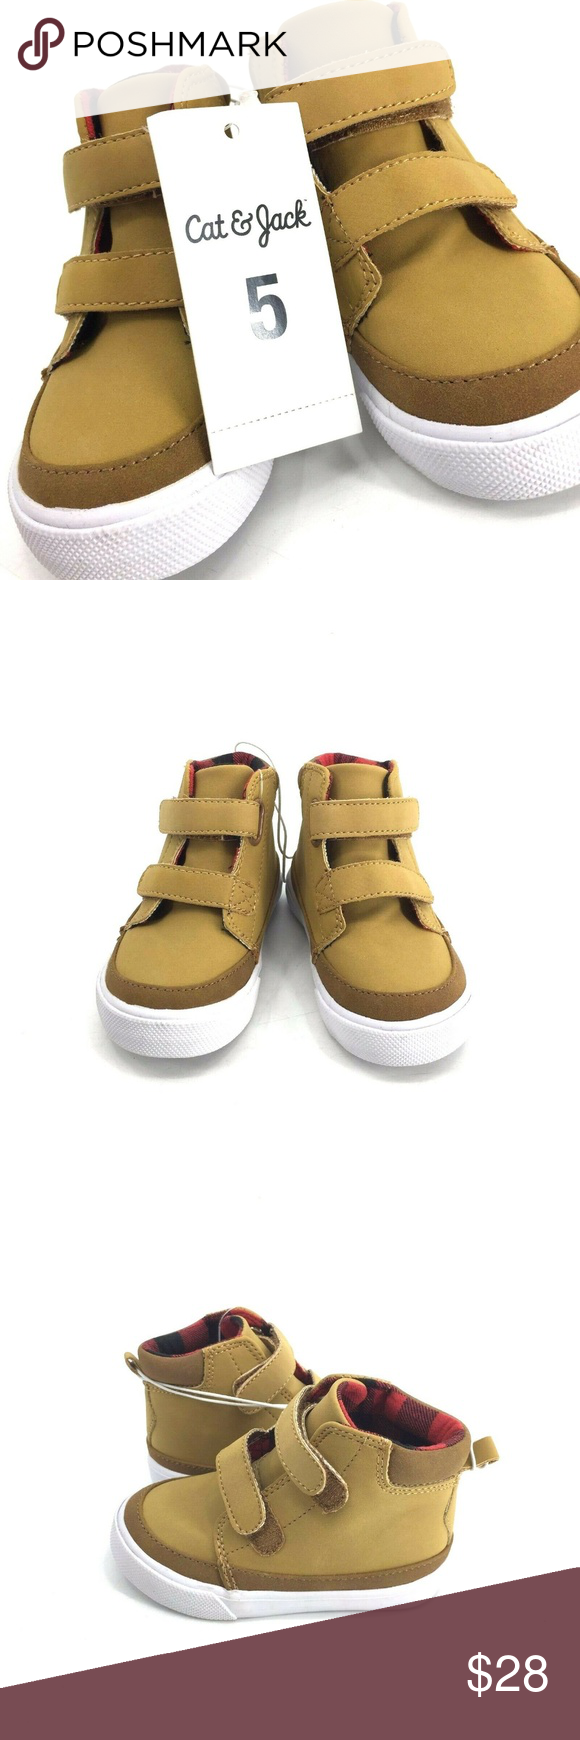 Cat \u0026 Jack Infant Toddler Boys Sneakers